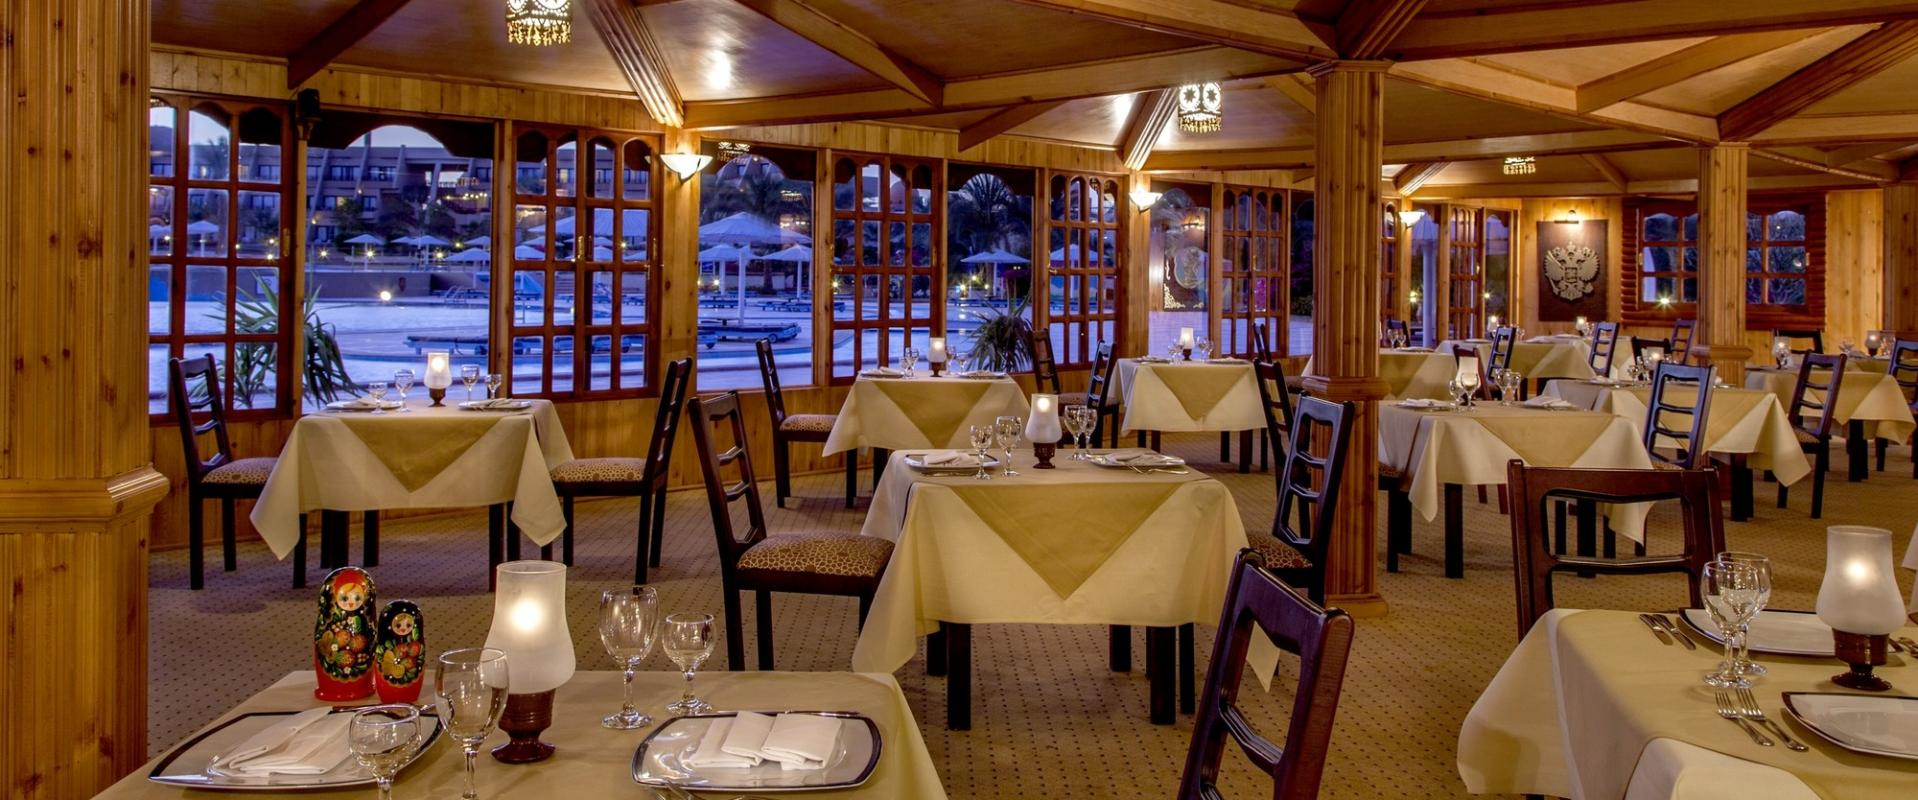 http://egypte.croisiere.voyage/wp-content/uploads/2016/11/HRG-SH-Hurghada-Matryoshka-Russian-Restaurant.jpg